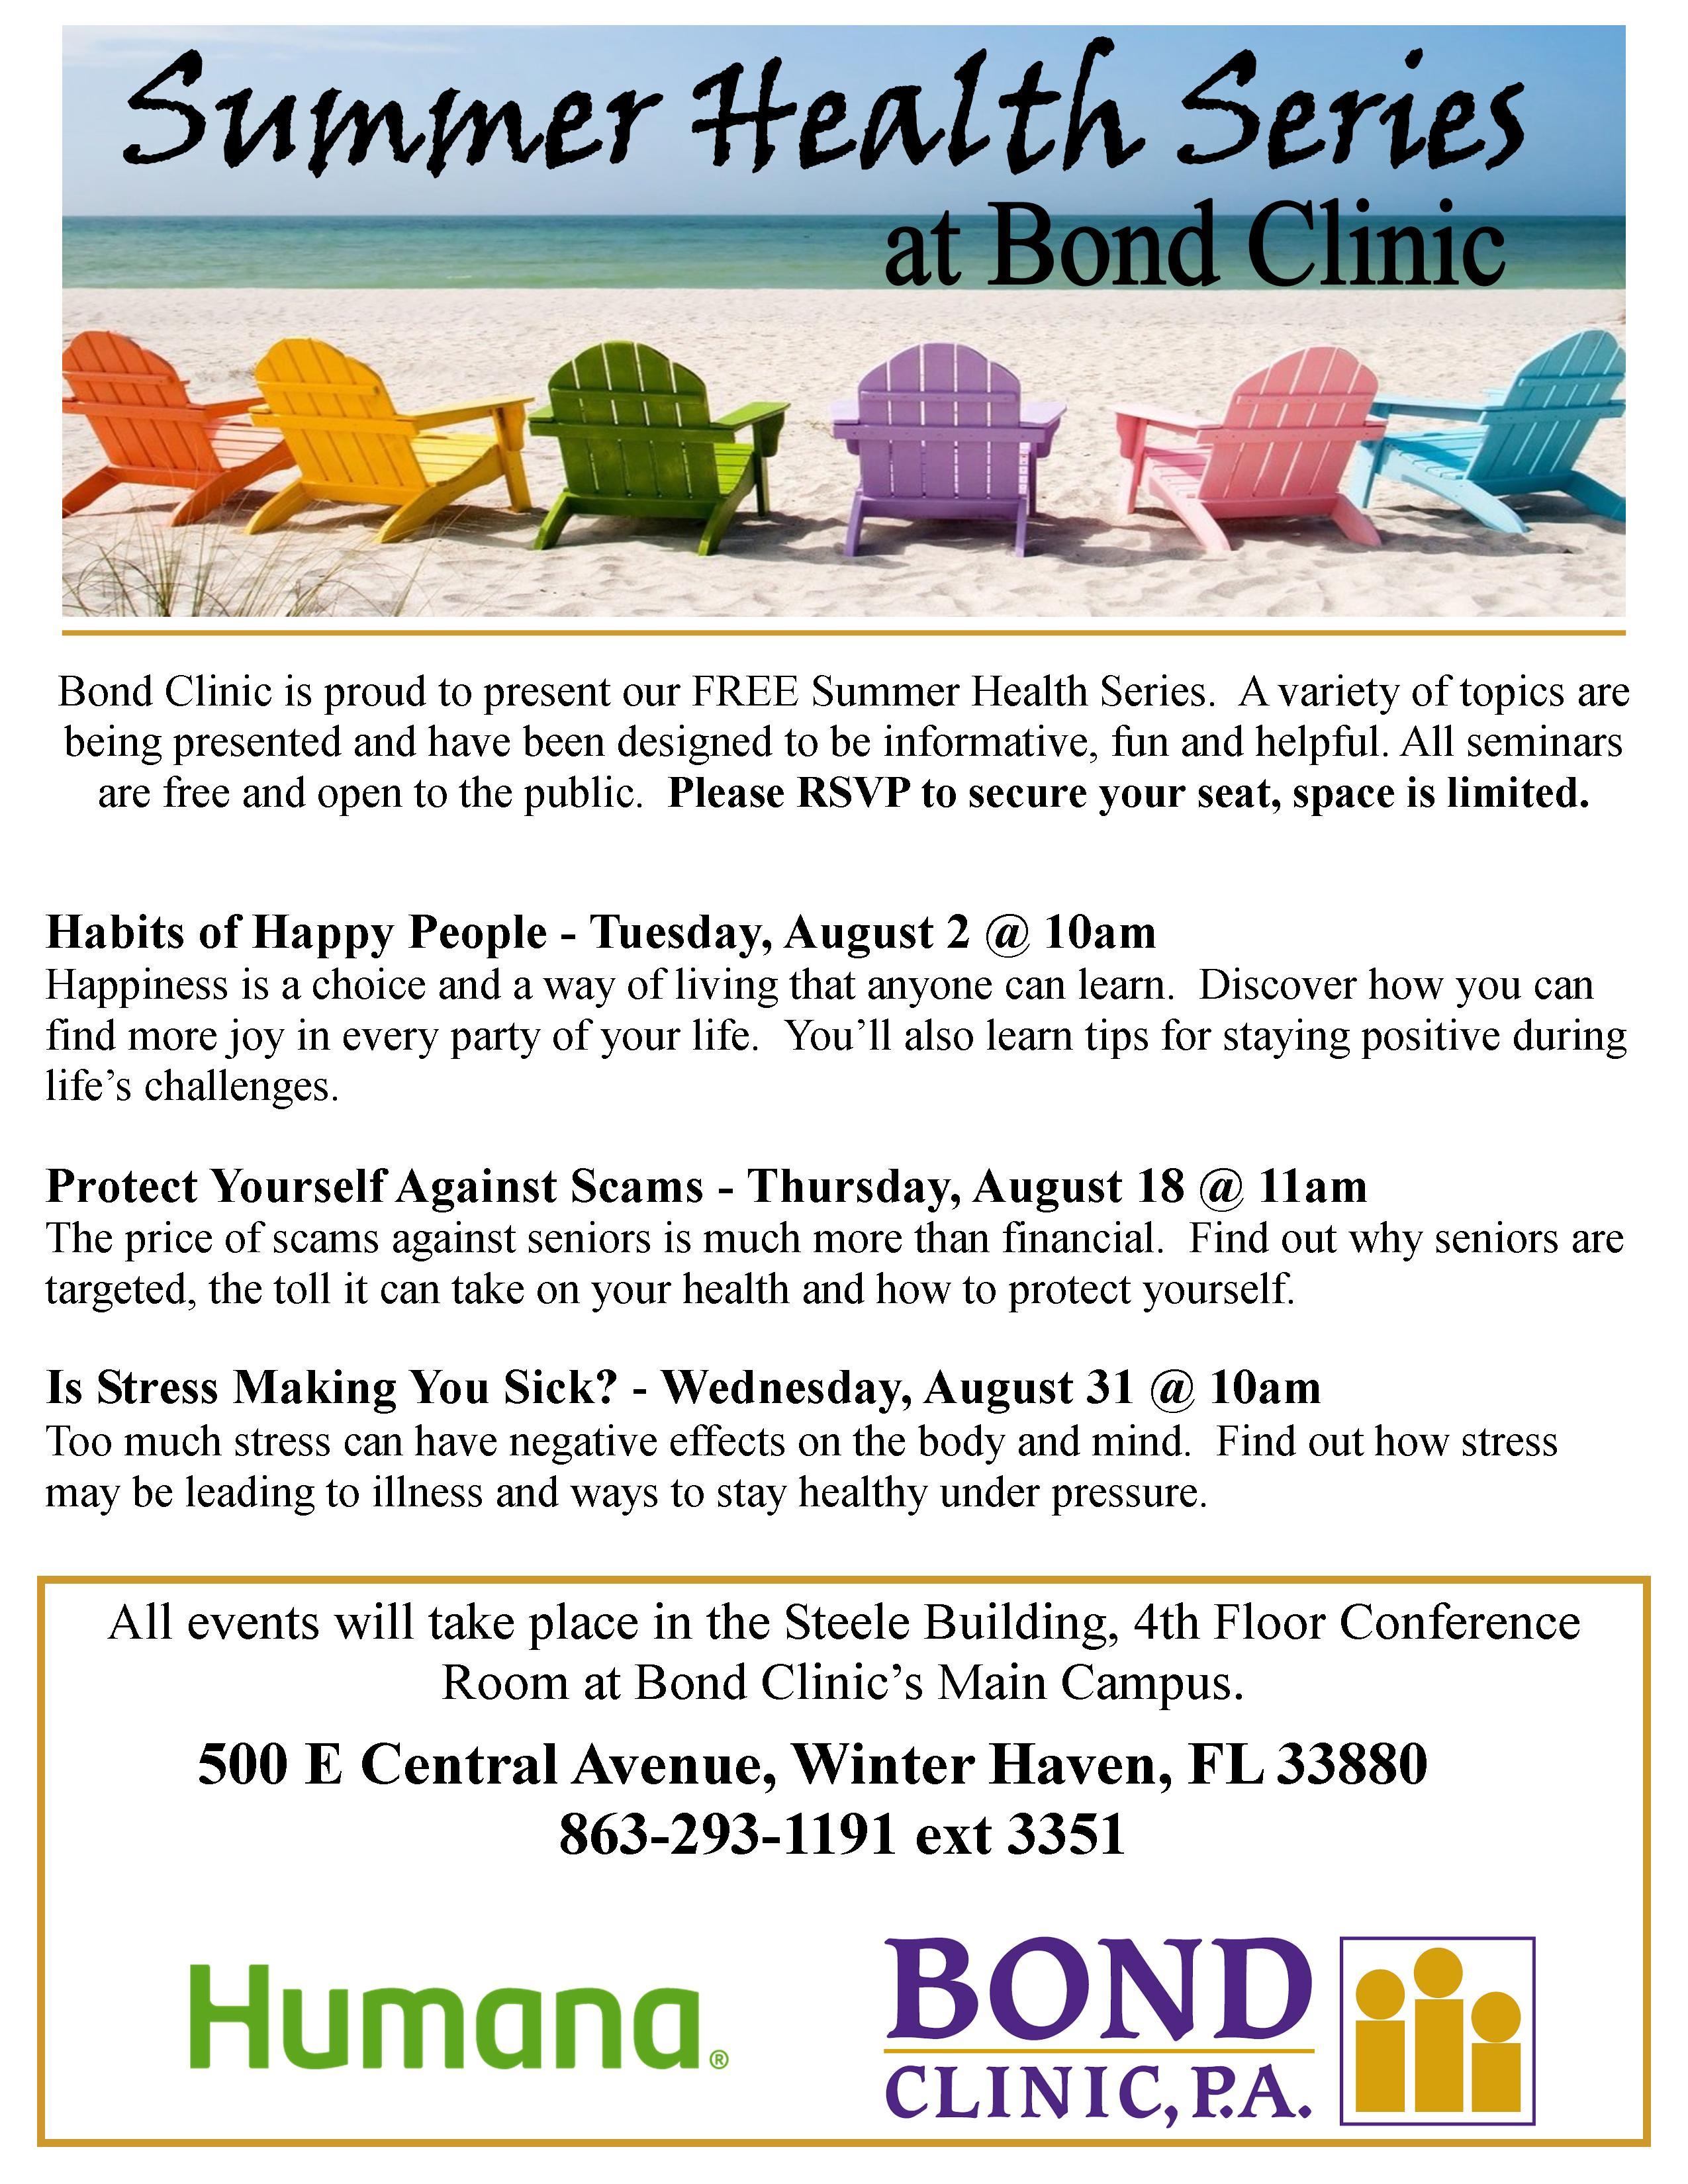 Summer Health Series At Bond Clinic